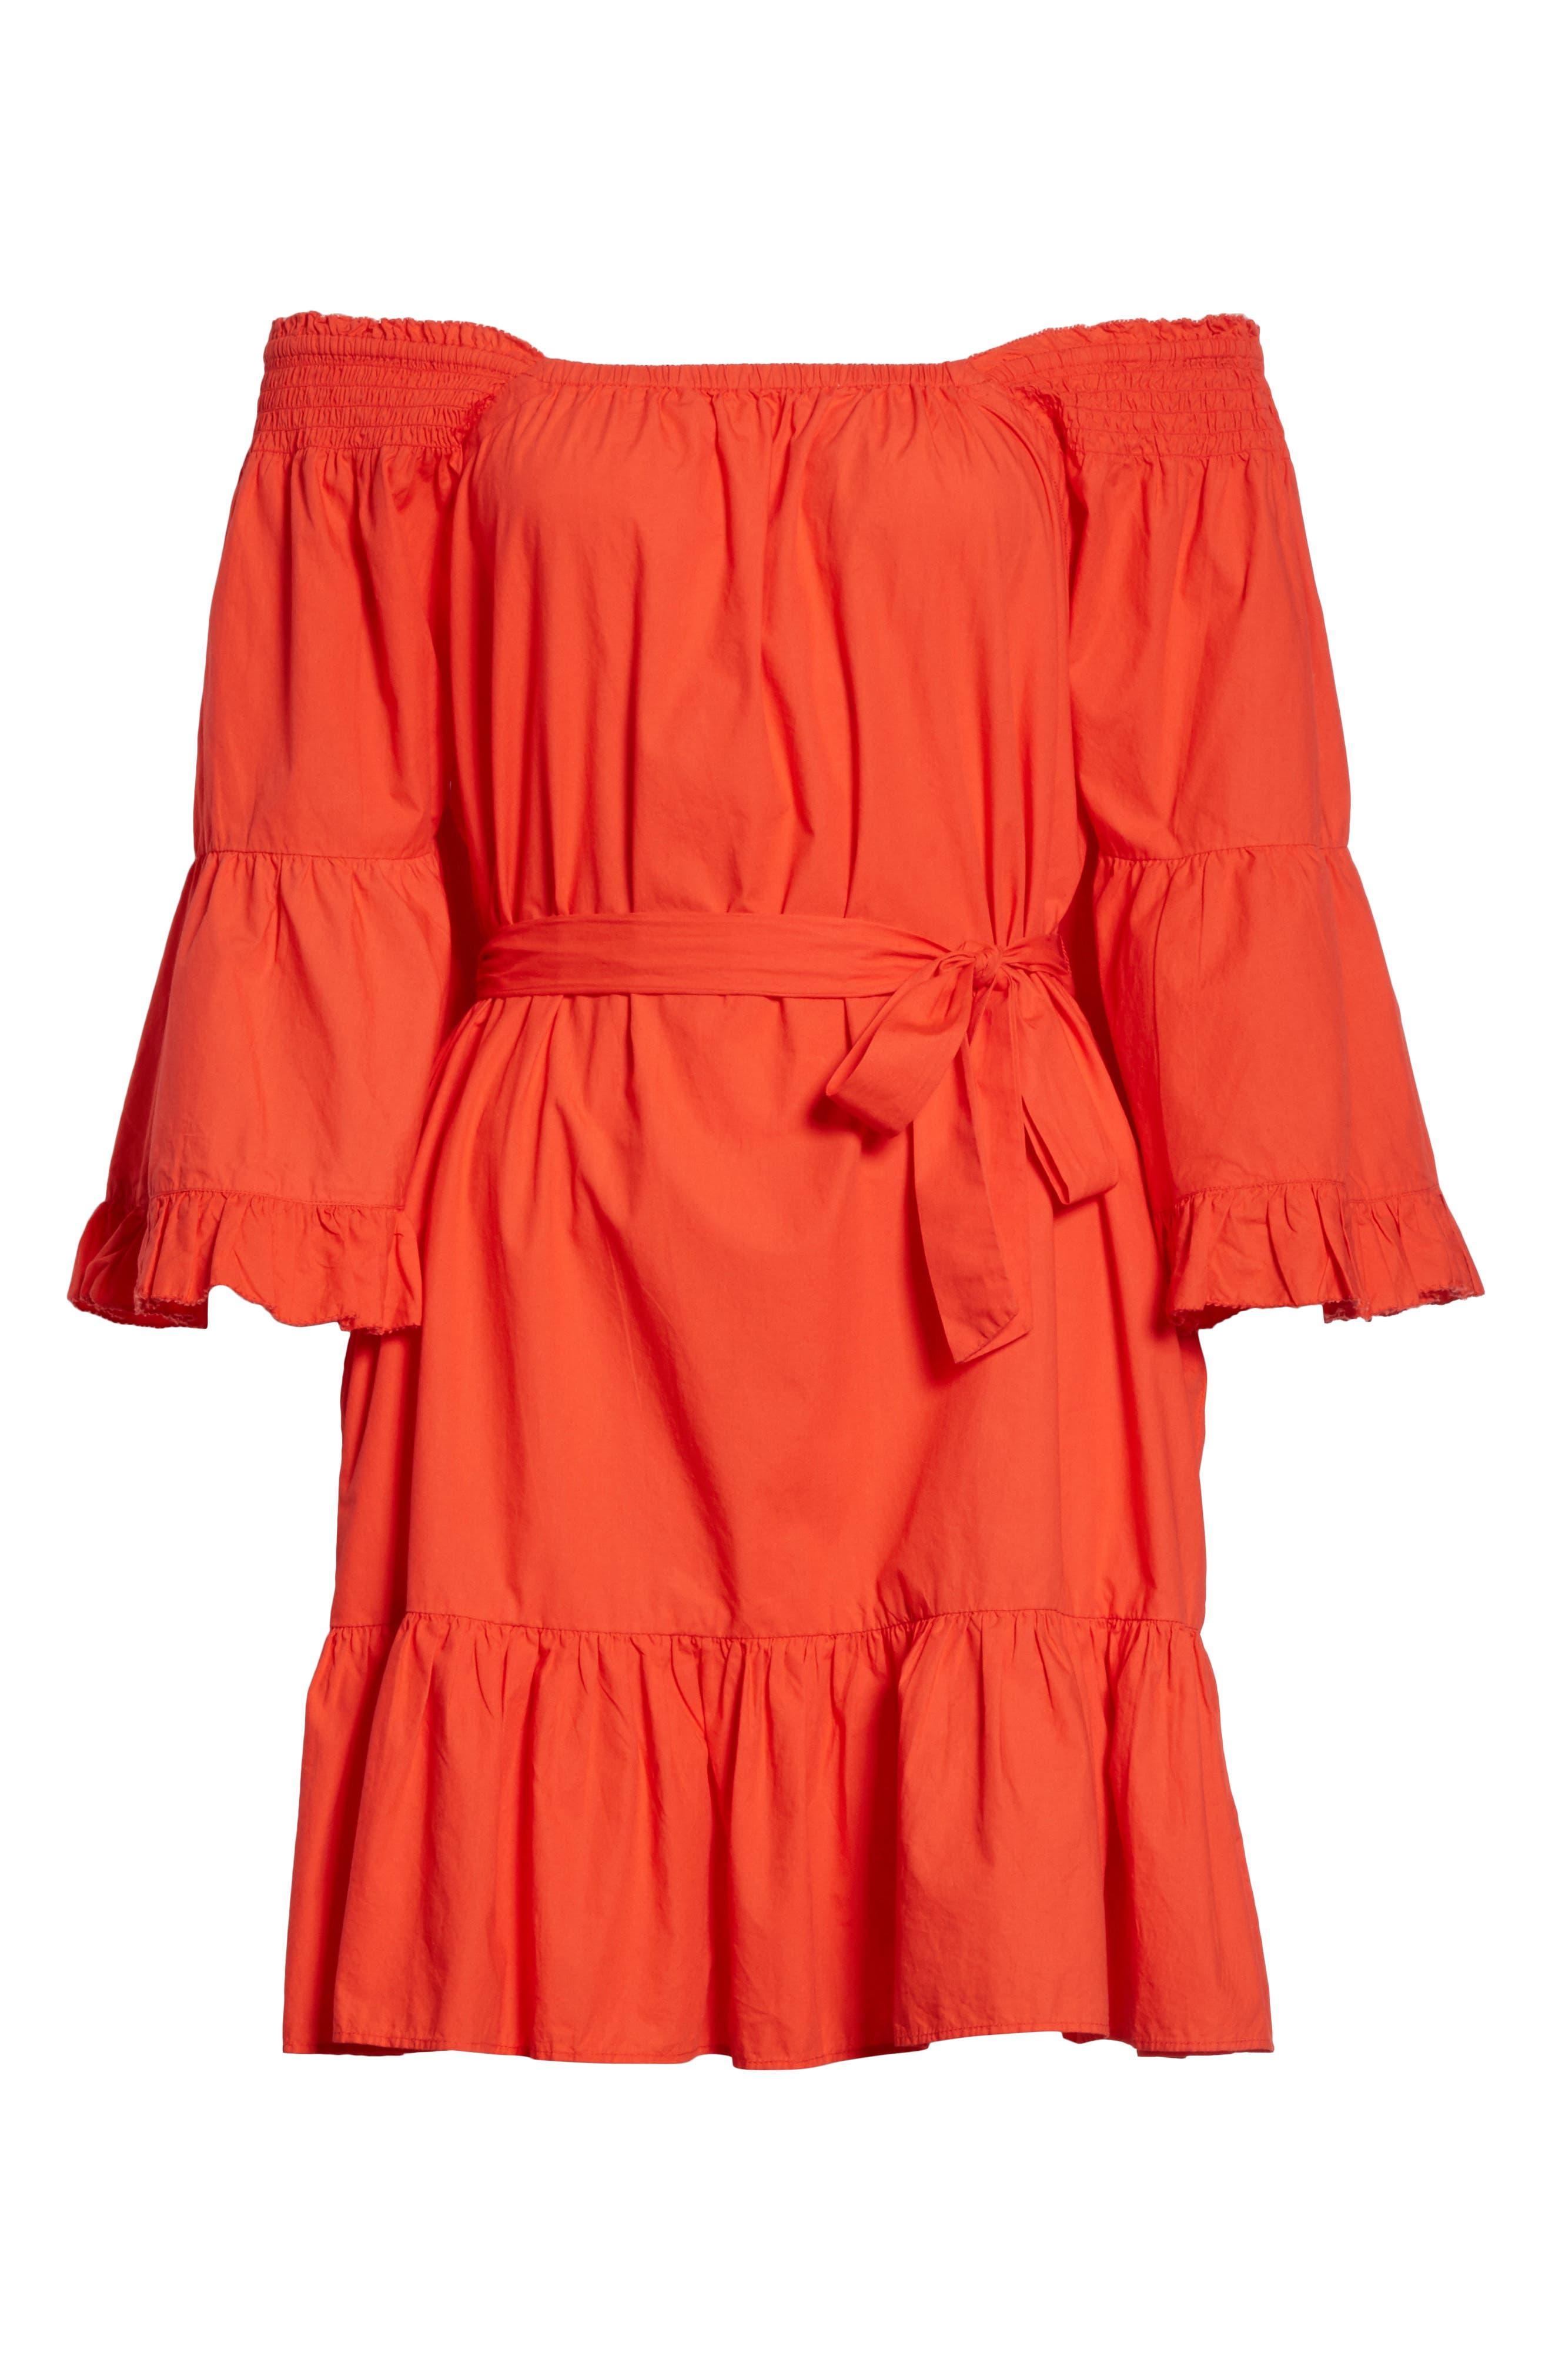 Colstona Ruffle Cotton Dress,                             Alternate thumbnail 6, color,                             800